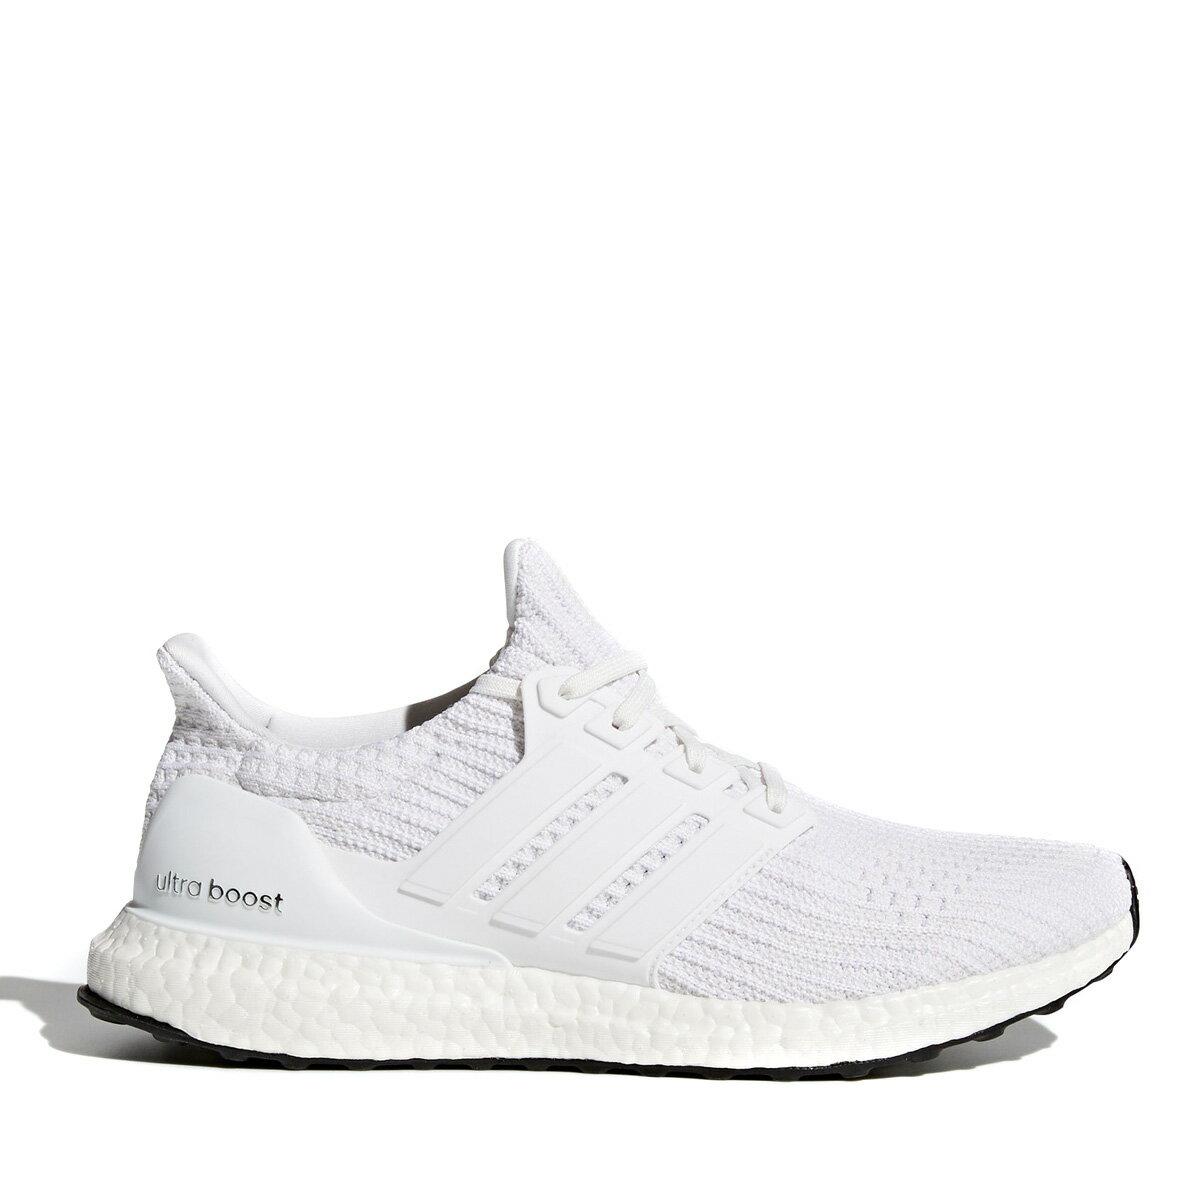 adidas UltraBOOST(アディダス ウルトラブースト)Running White/Running White/Running White【メンズ スニーカー】18SS-I